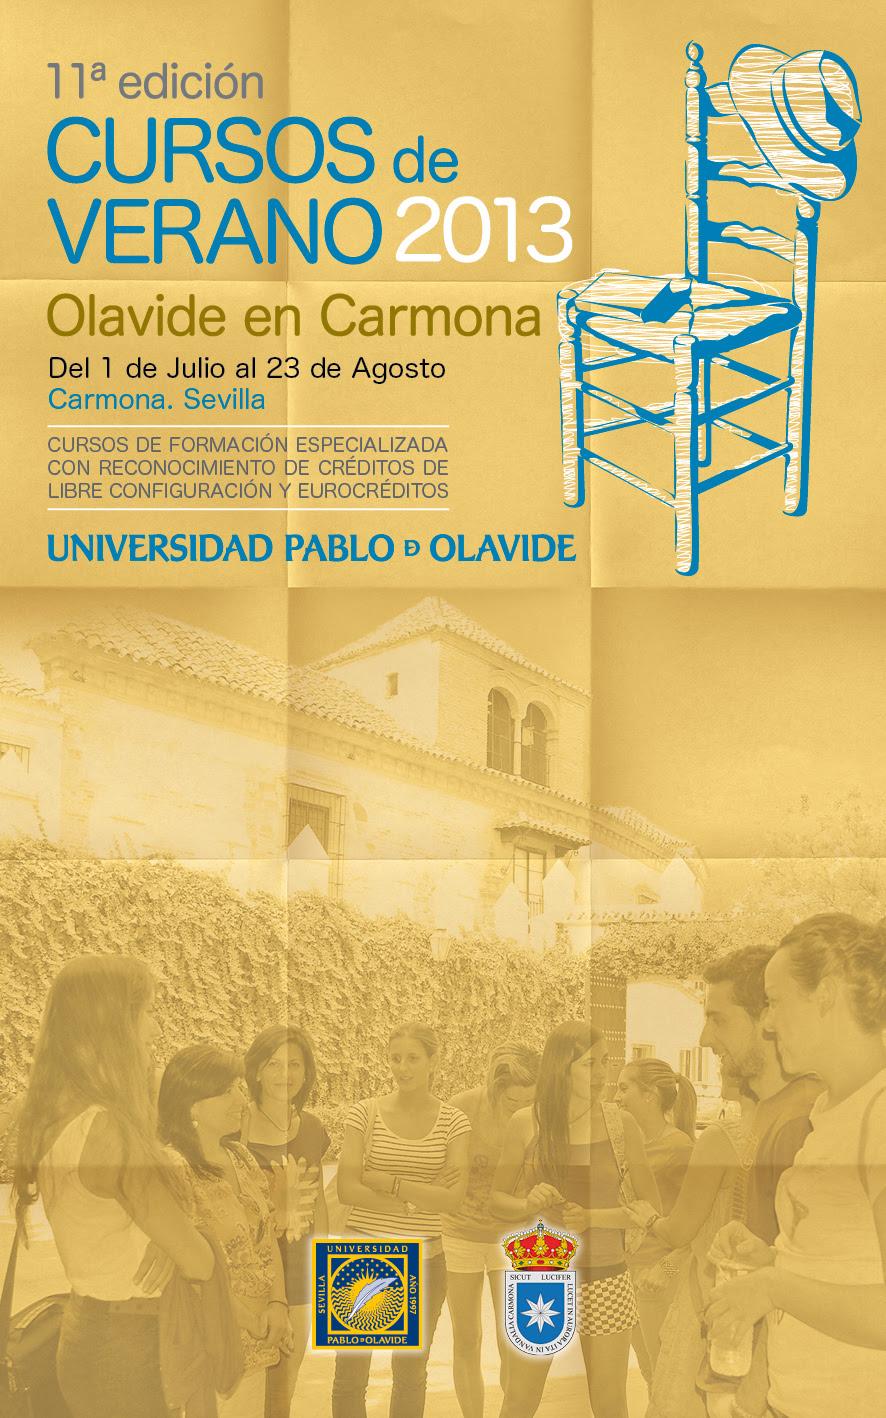 Imagen_portada_cursos_de_verano_2013